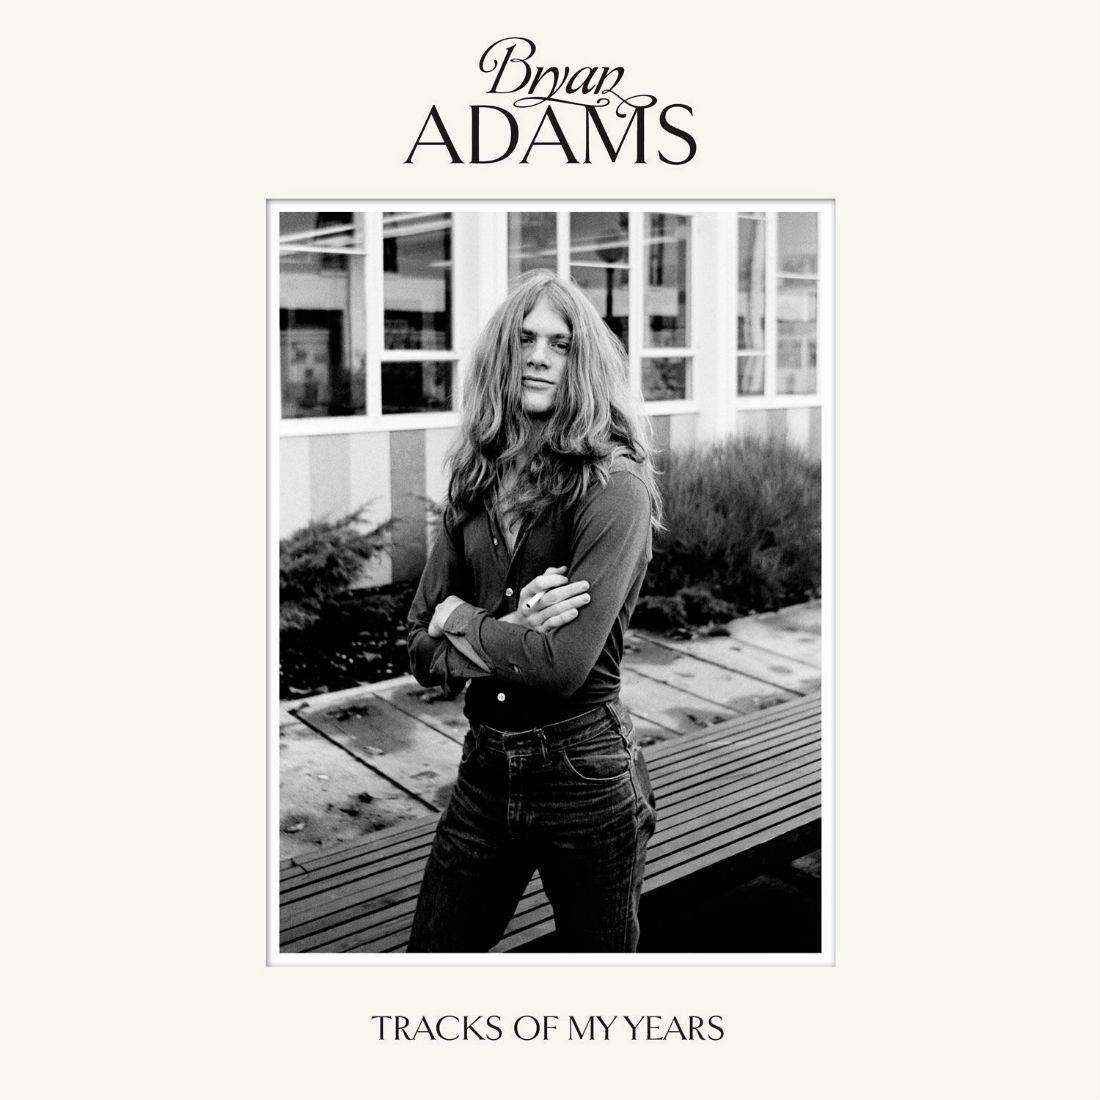 bryan adams tracks of my years